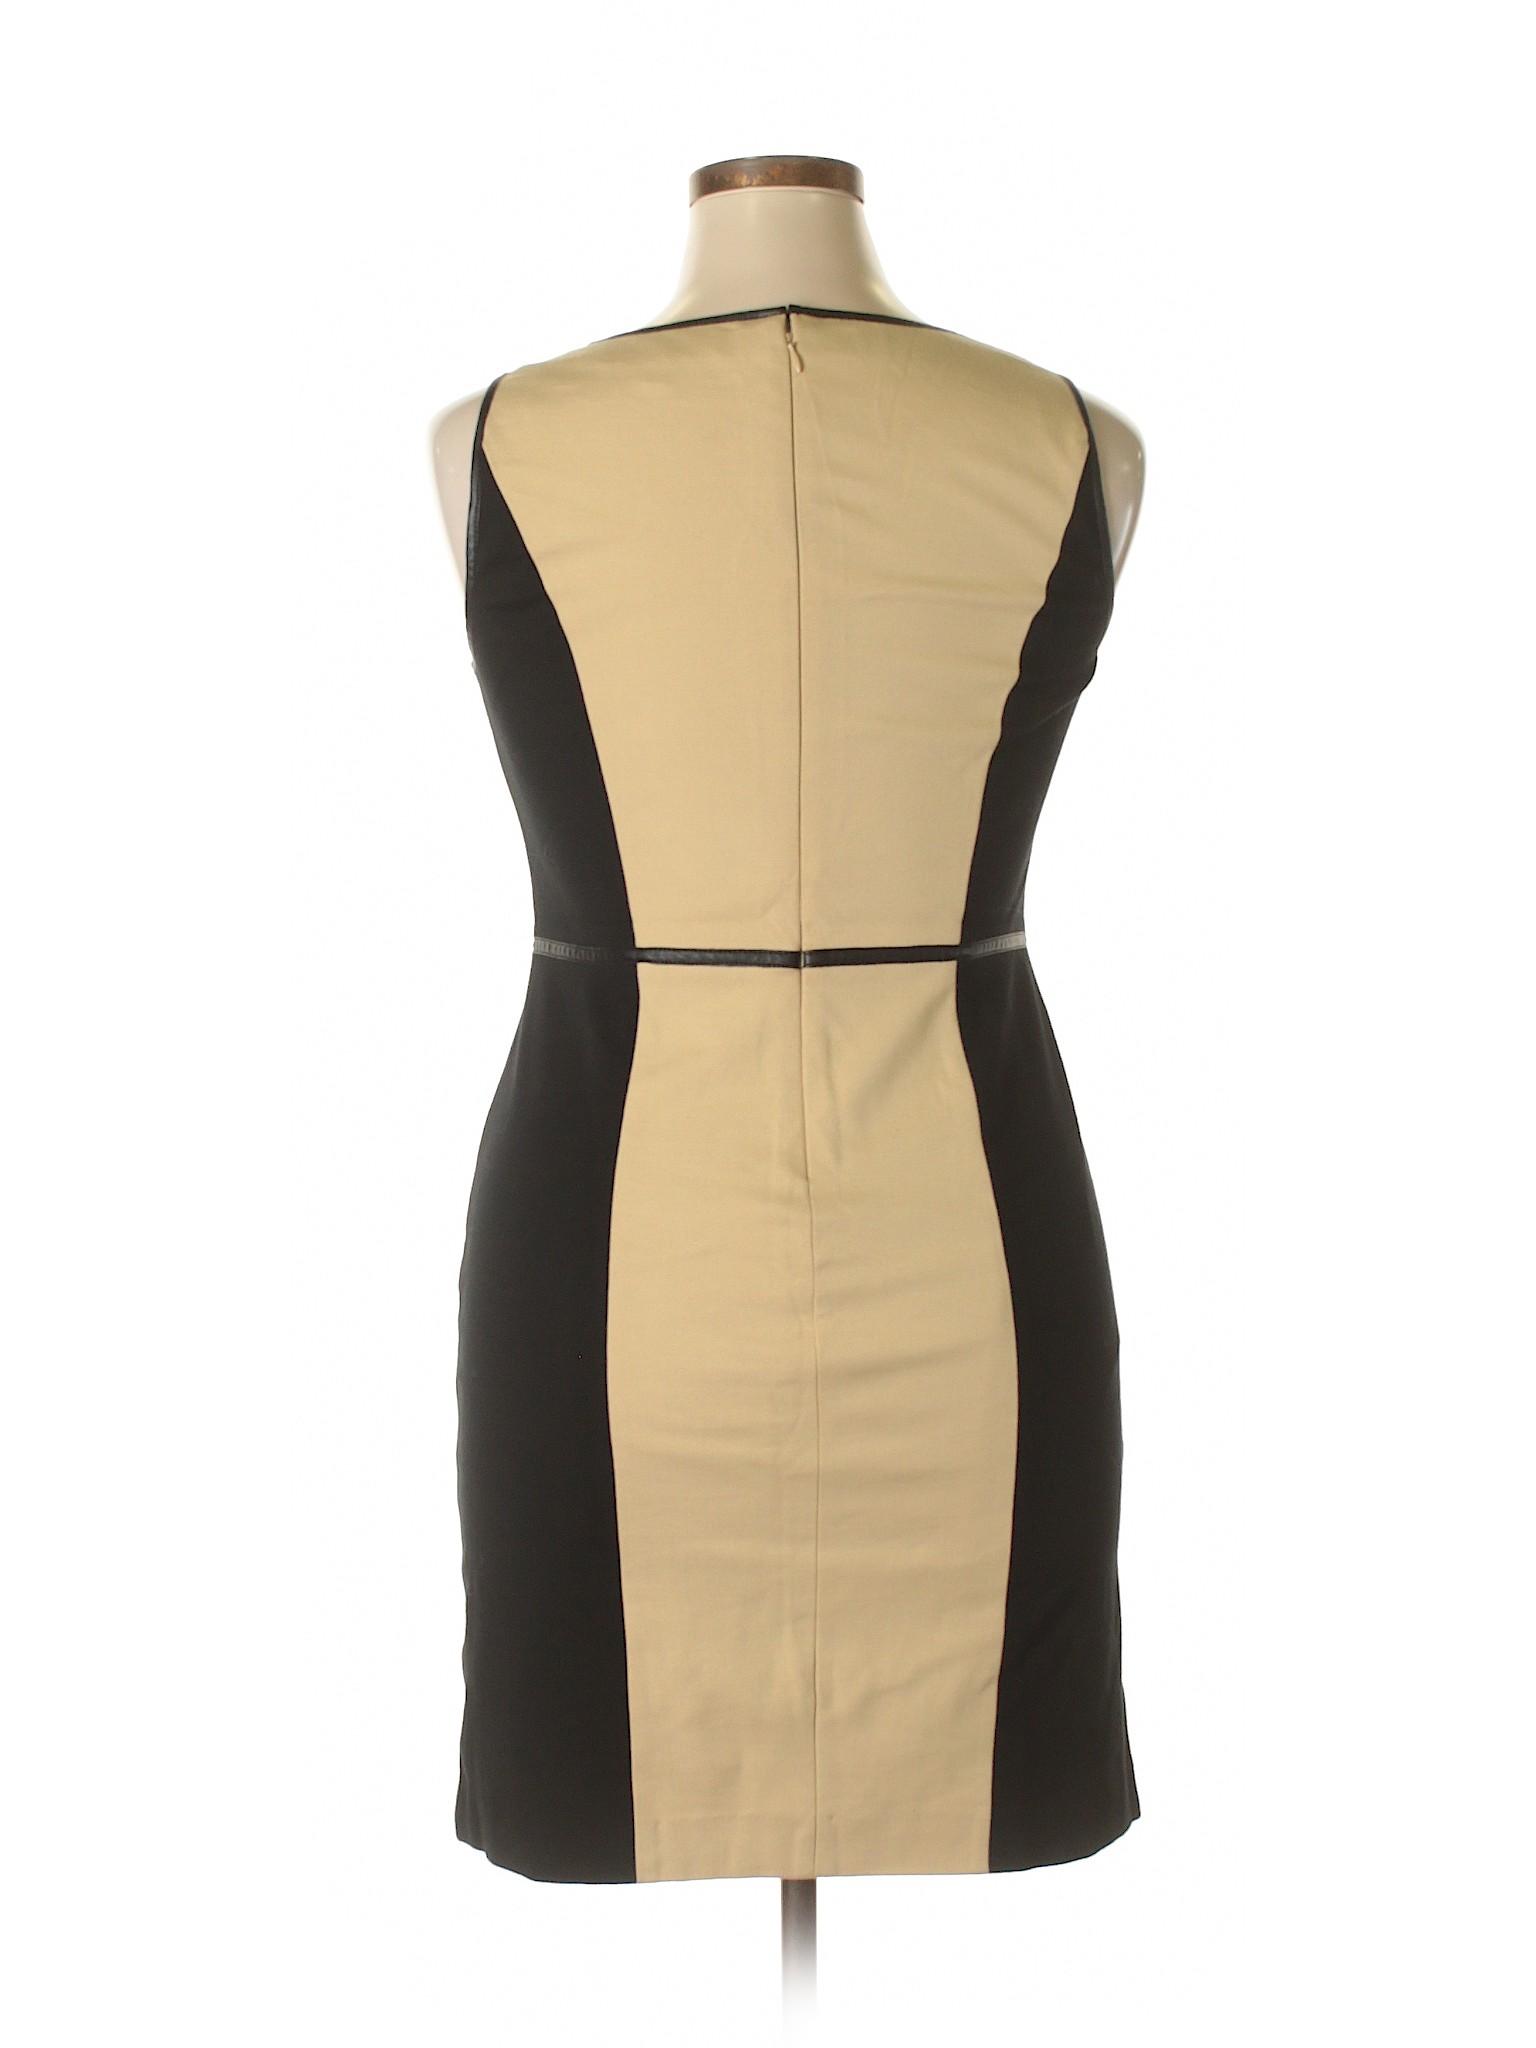 Steffe Cynthia Selling Selling Cynthia Casual Dress wxq6Bqz